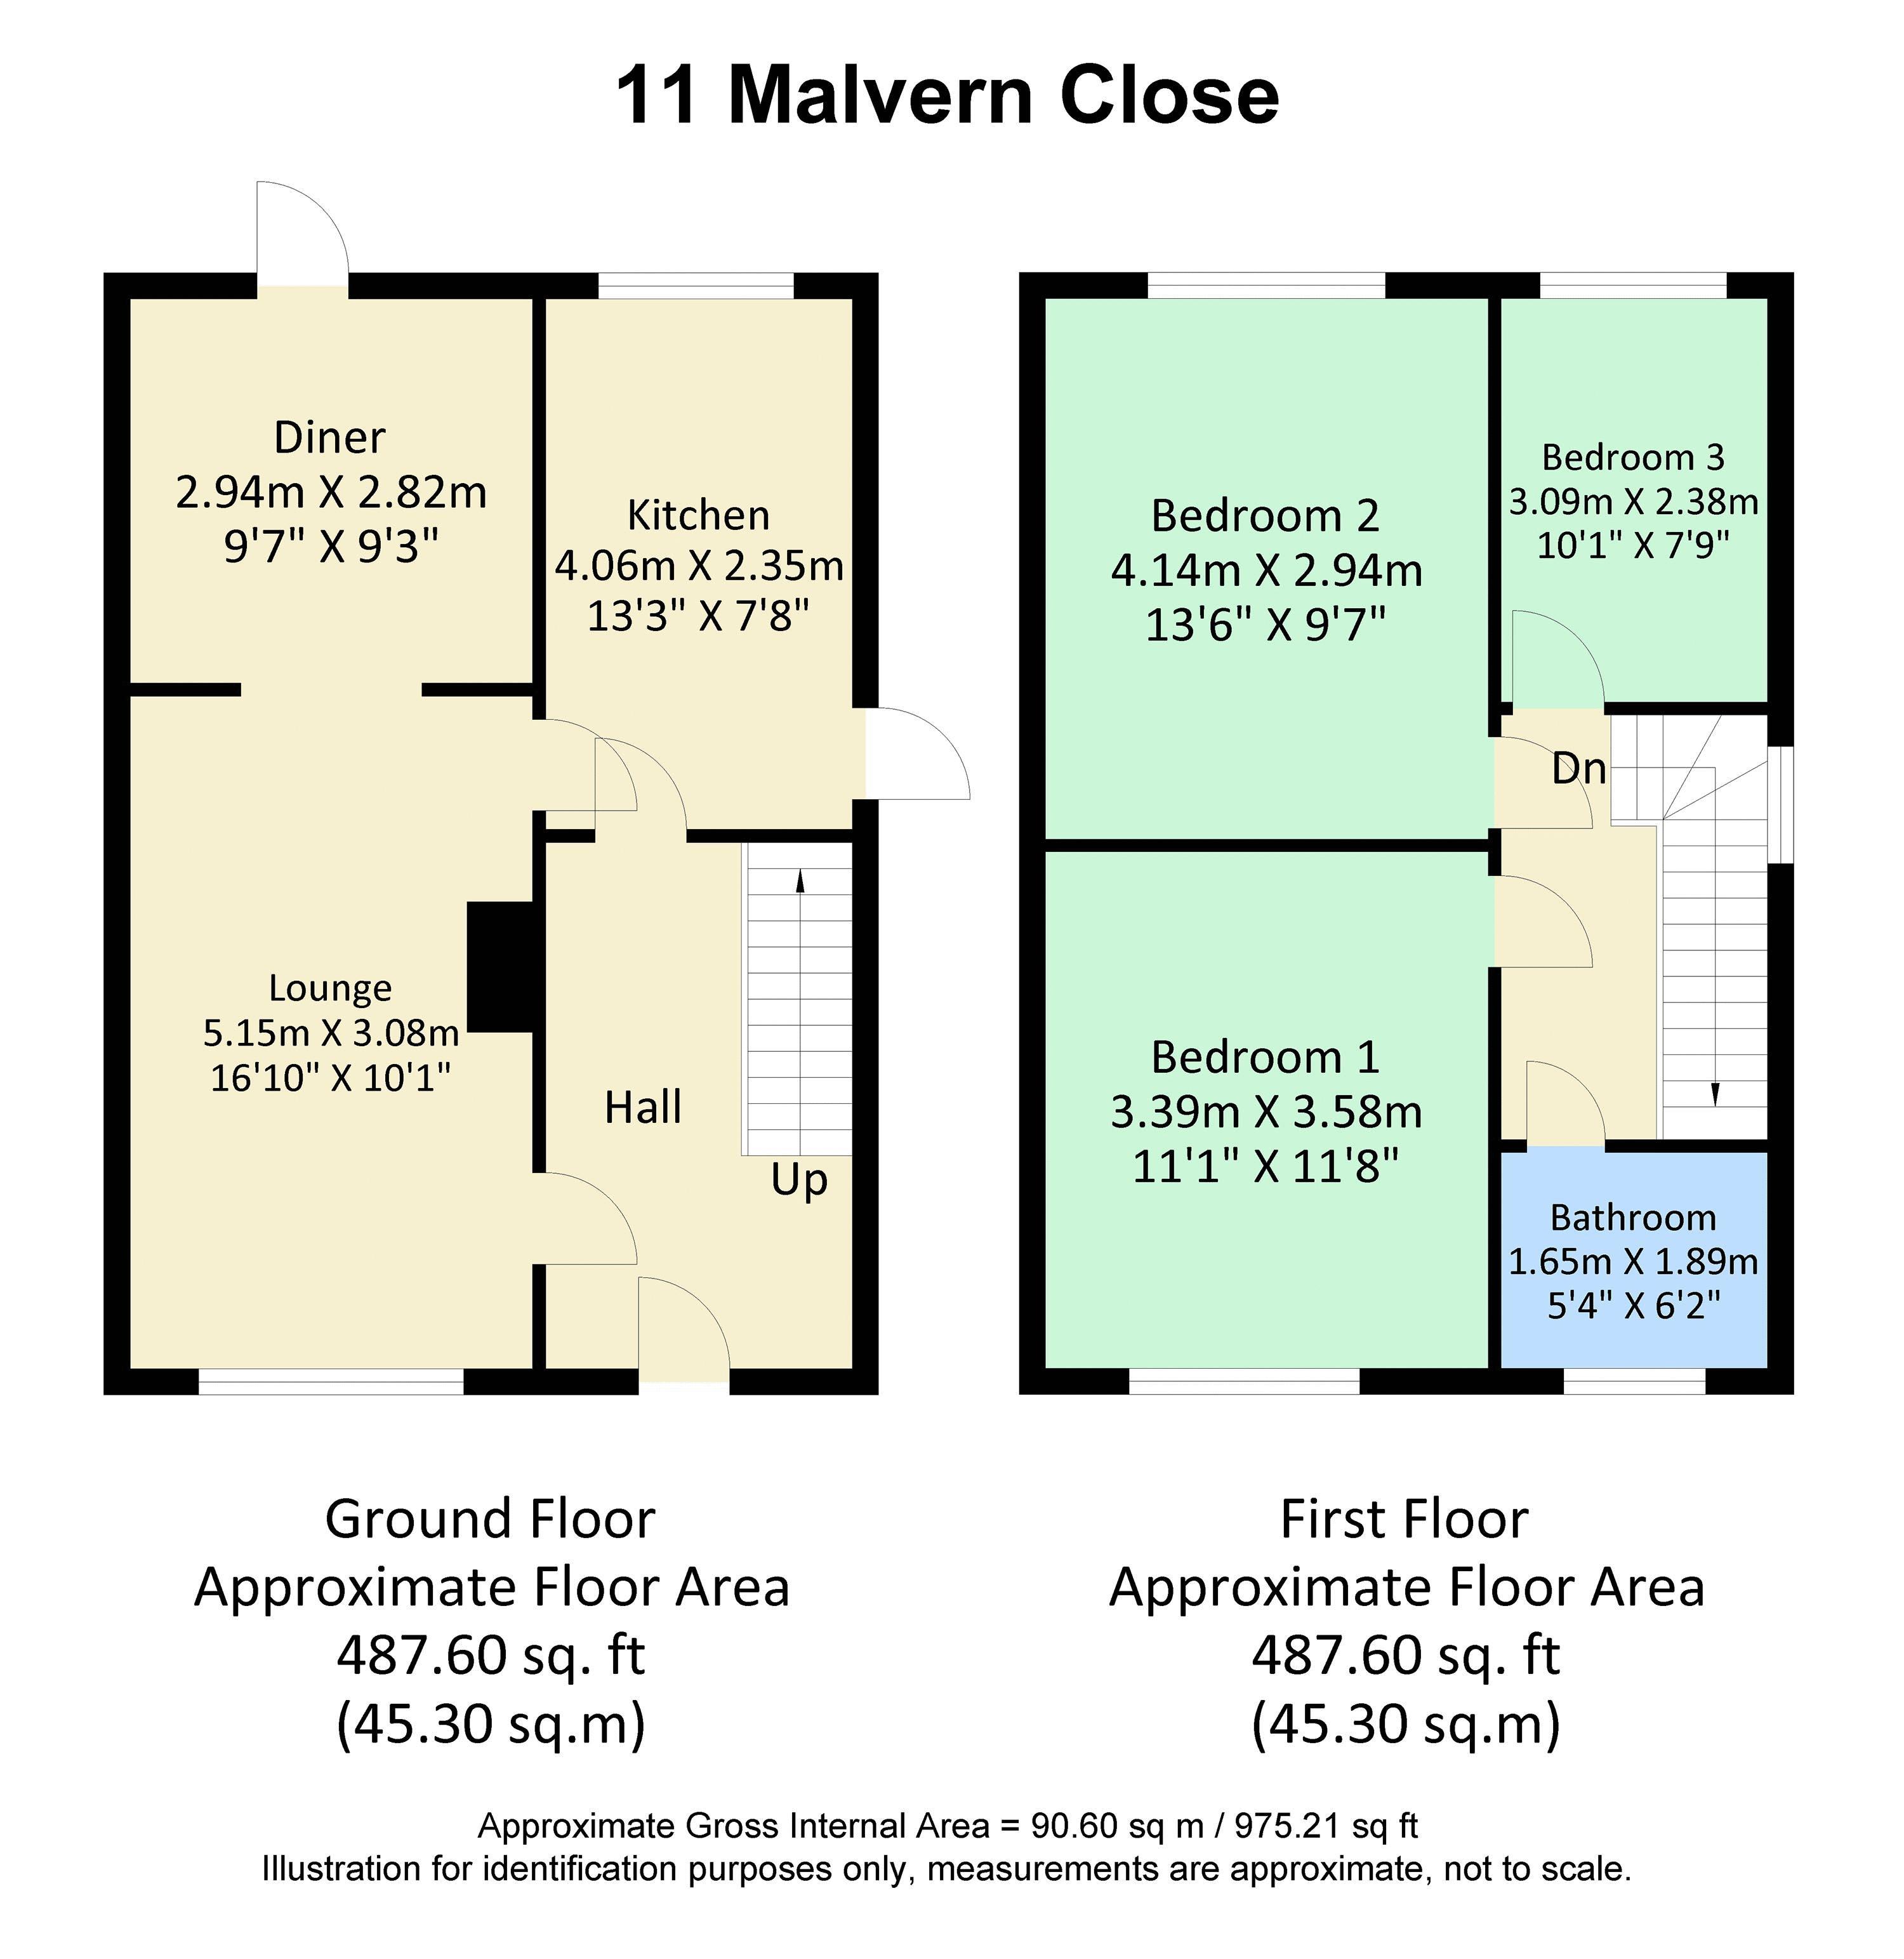 11 Malvern Close